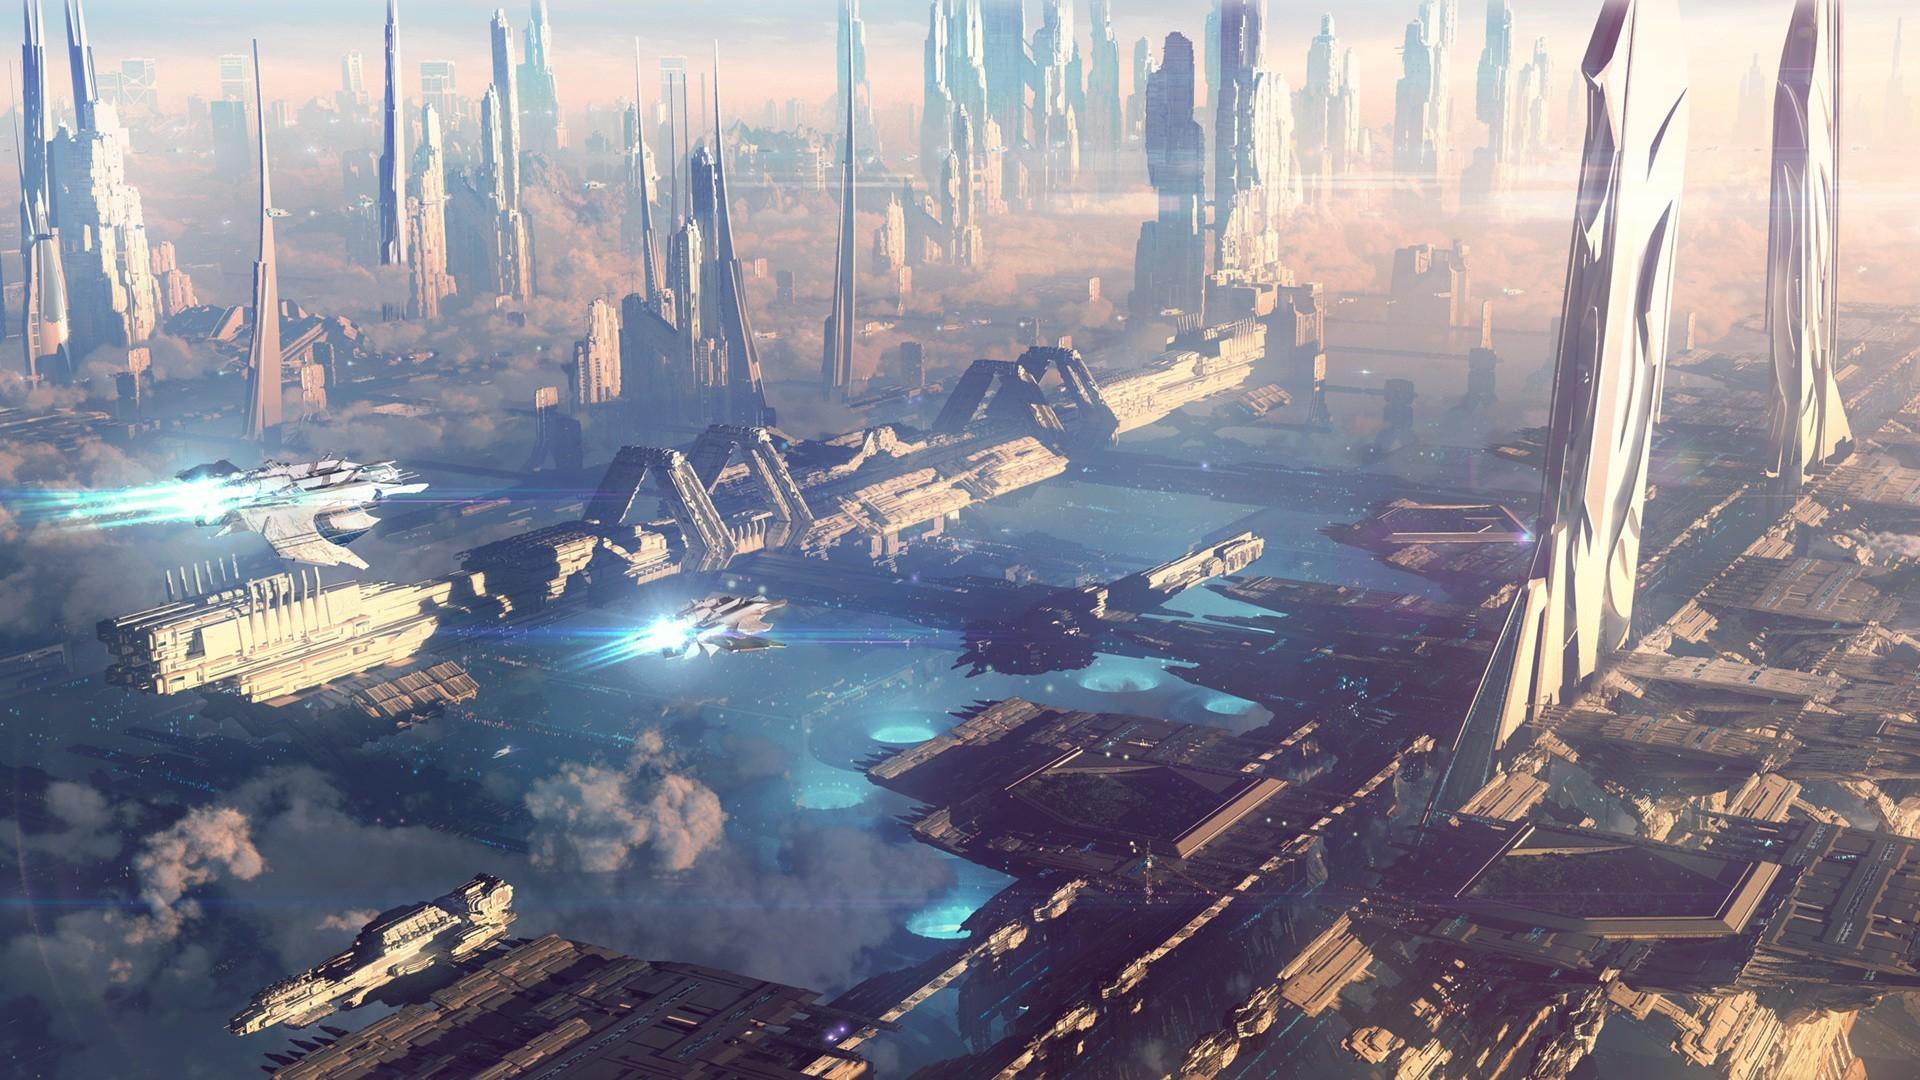 futuristic-city-wallpaper-30.jpg (1920×1080)   Futuristic Cities    Pinterest   Sci fi, Futuristic city and Concept art